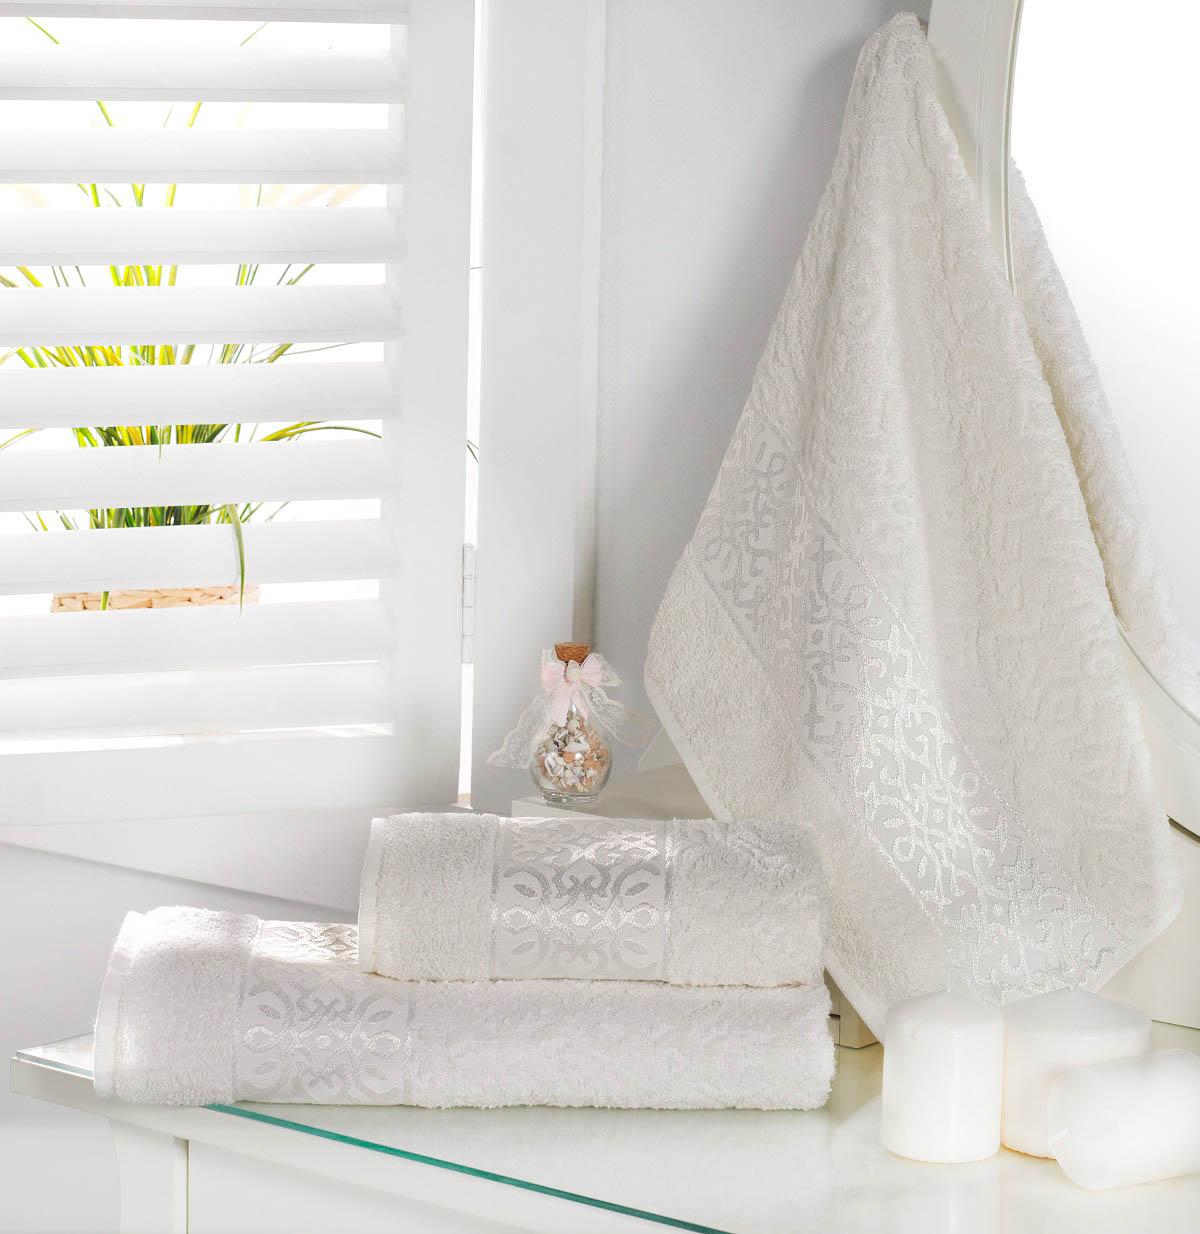 Полотенца Karna Полотенце Sahra Цвет: Кремовый (70х140 см) полотенца karna полотенце iteka цвет коричневый 70х140 см